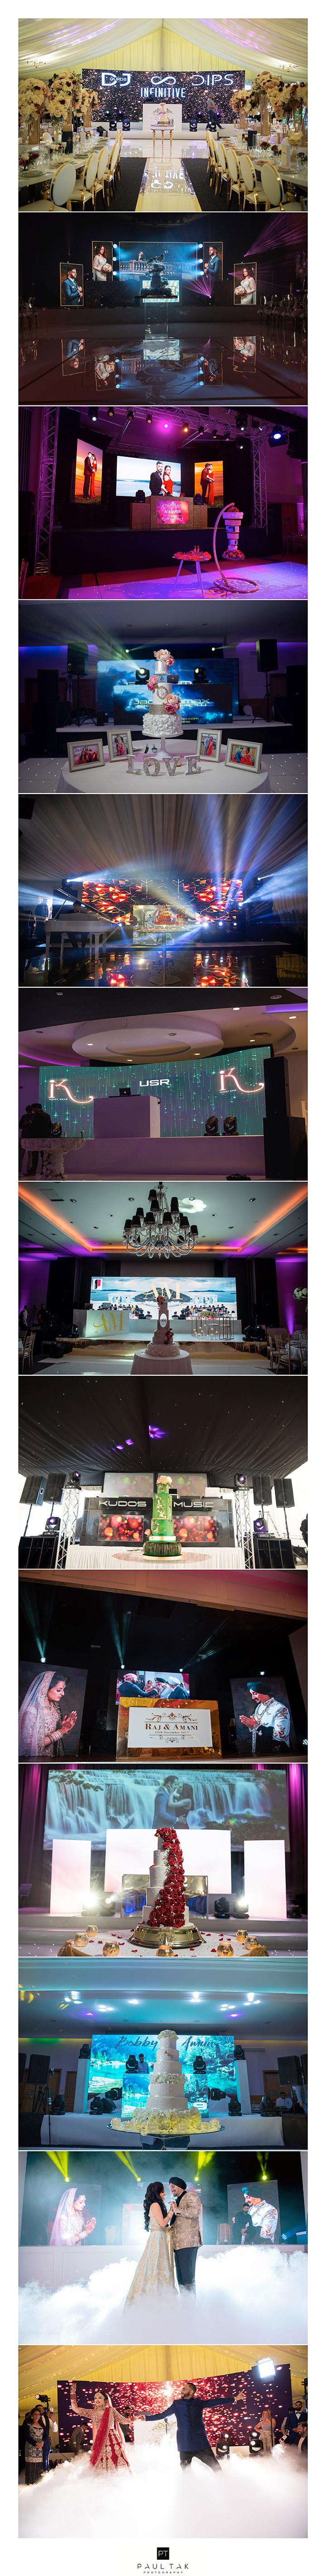 Blog post asian wedding djs indian wedding photography